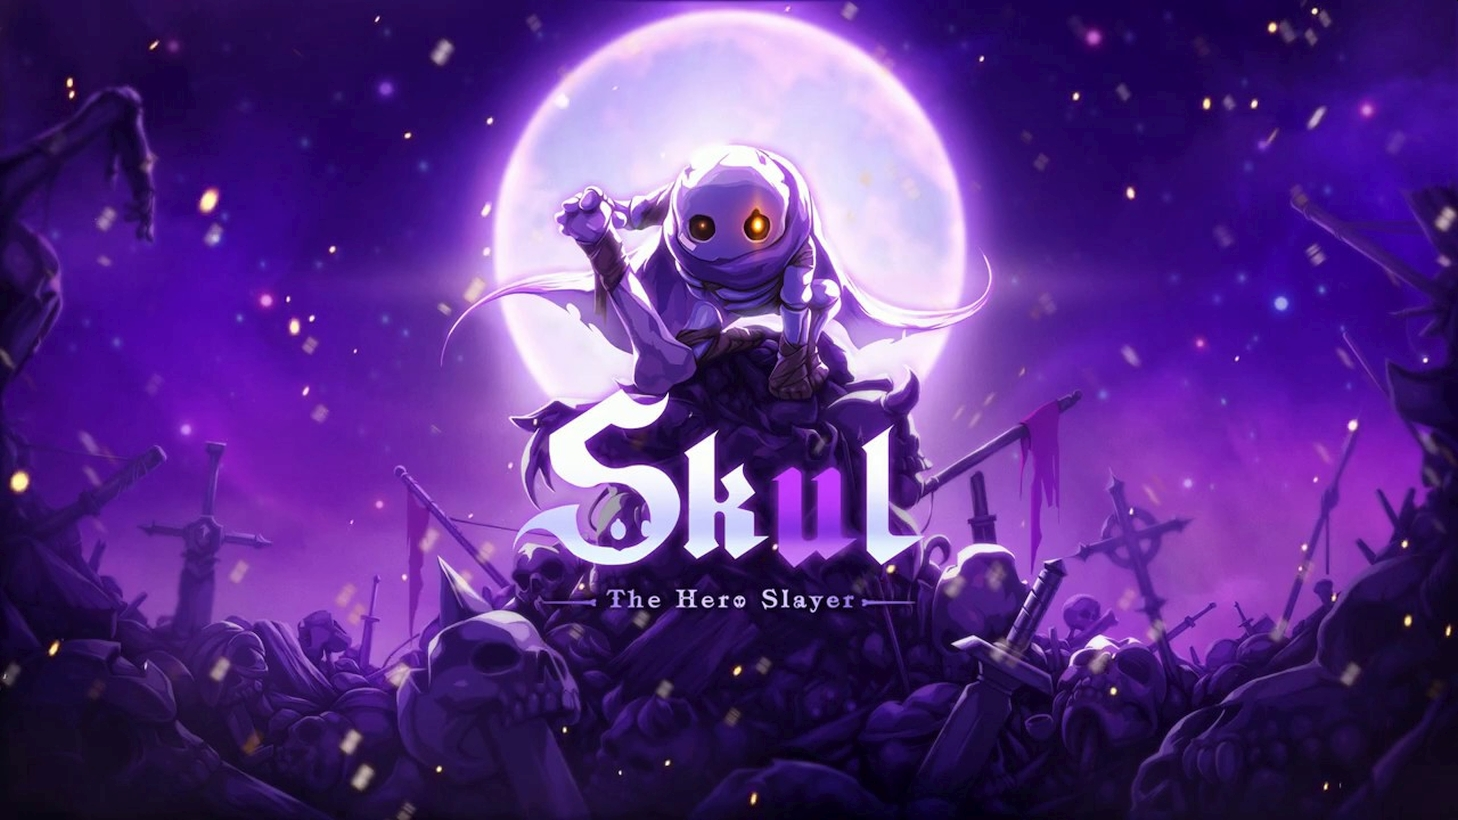 Skul: The Hero Slayer Graduates Steam Early Access On January 21